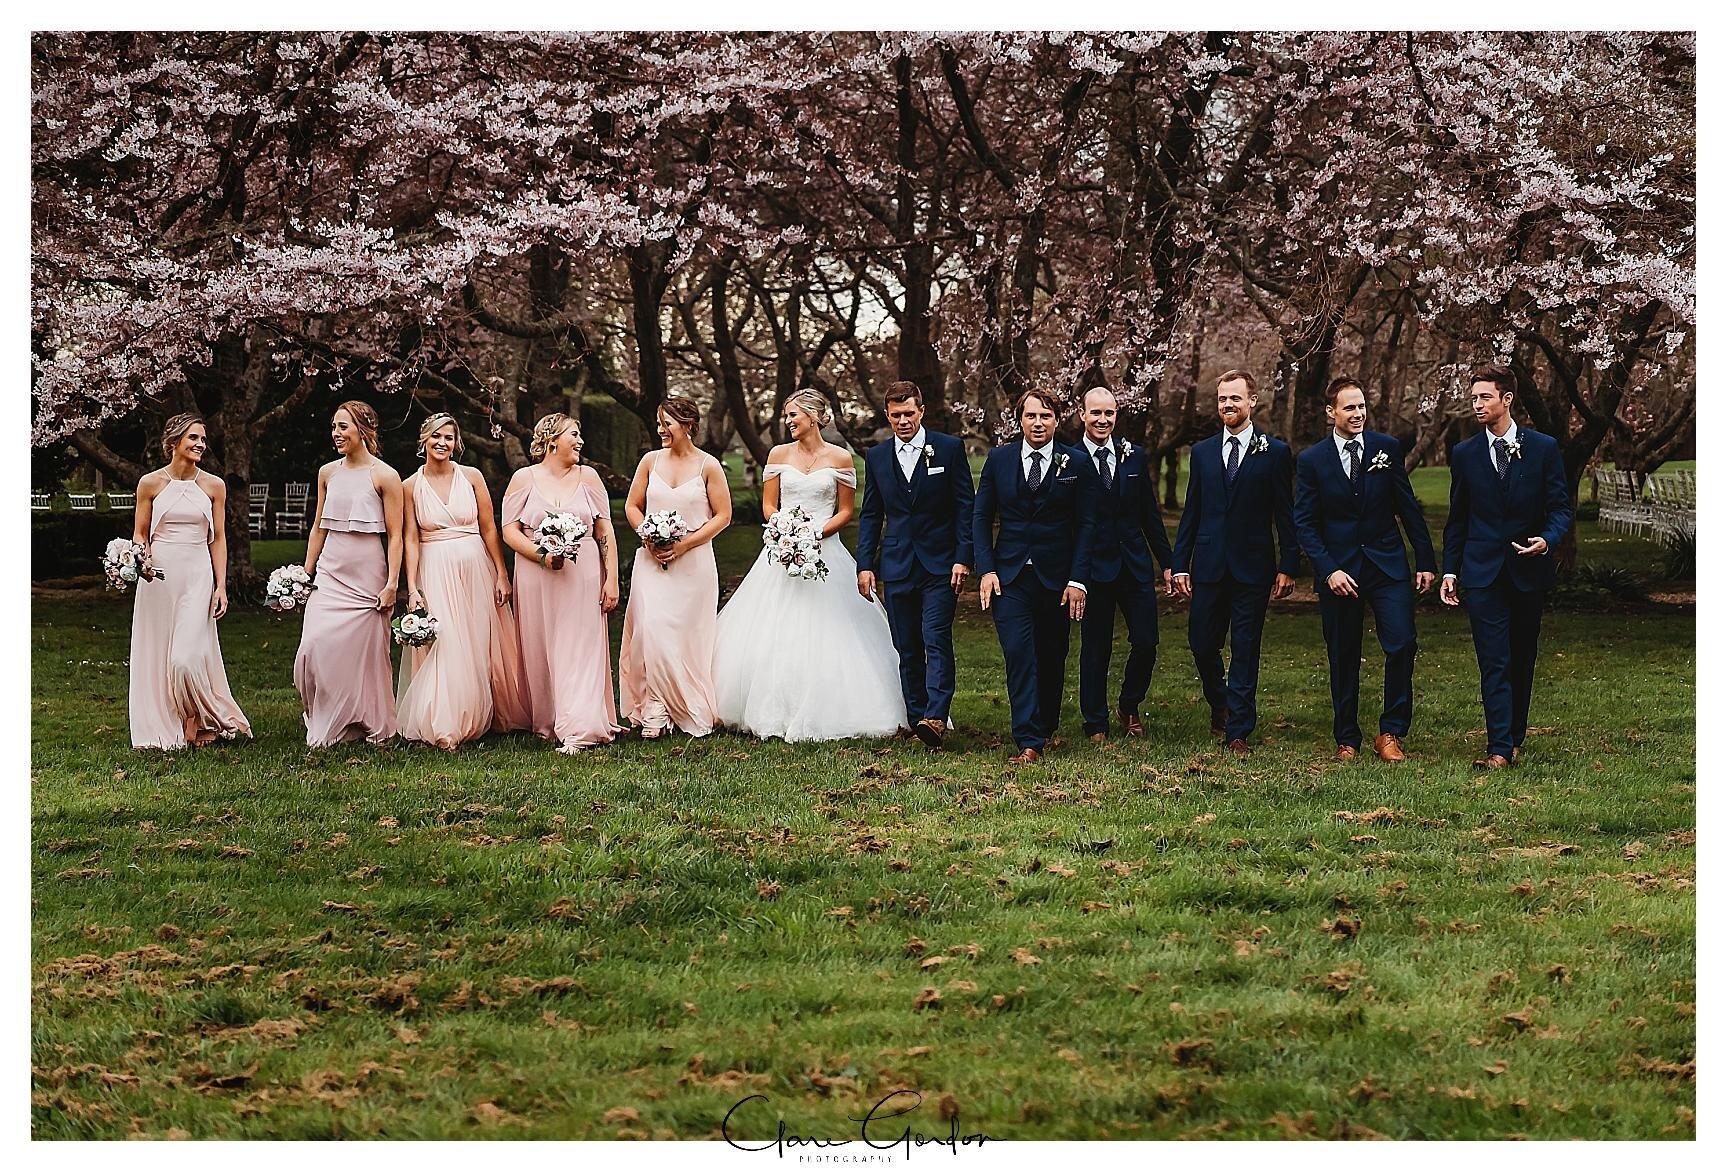 Henley-Hotel-Cherry-blossom-wedding-photos (57).jpg